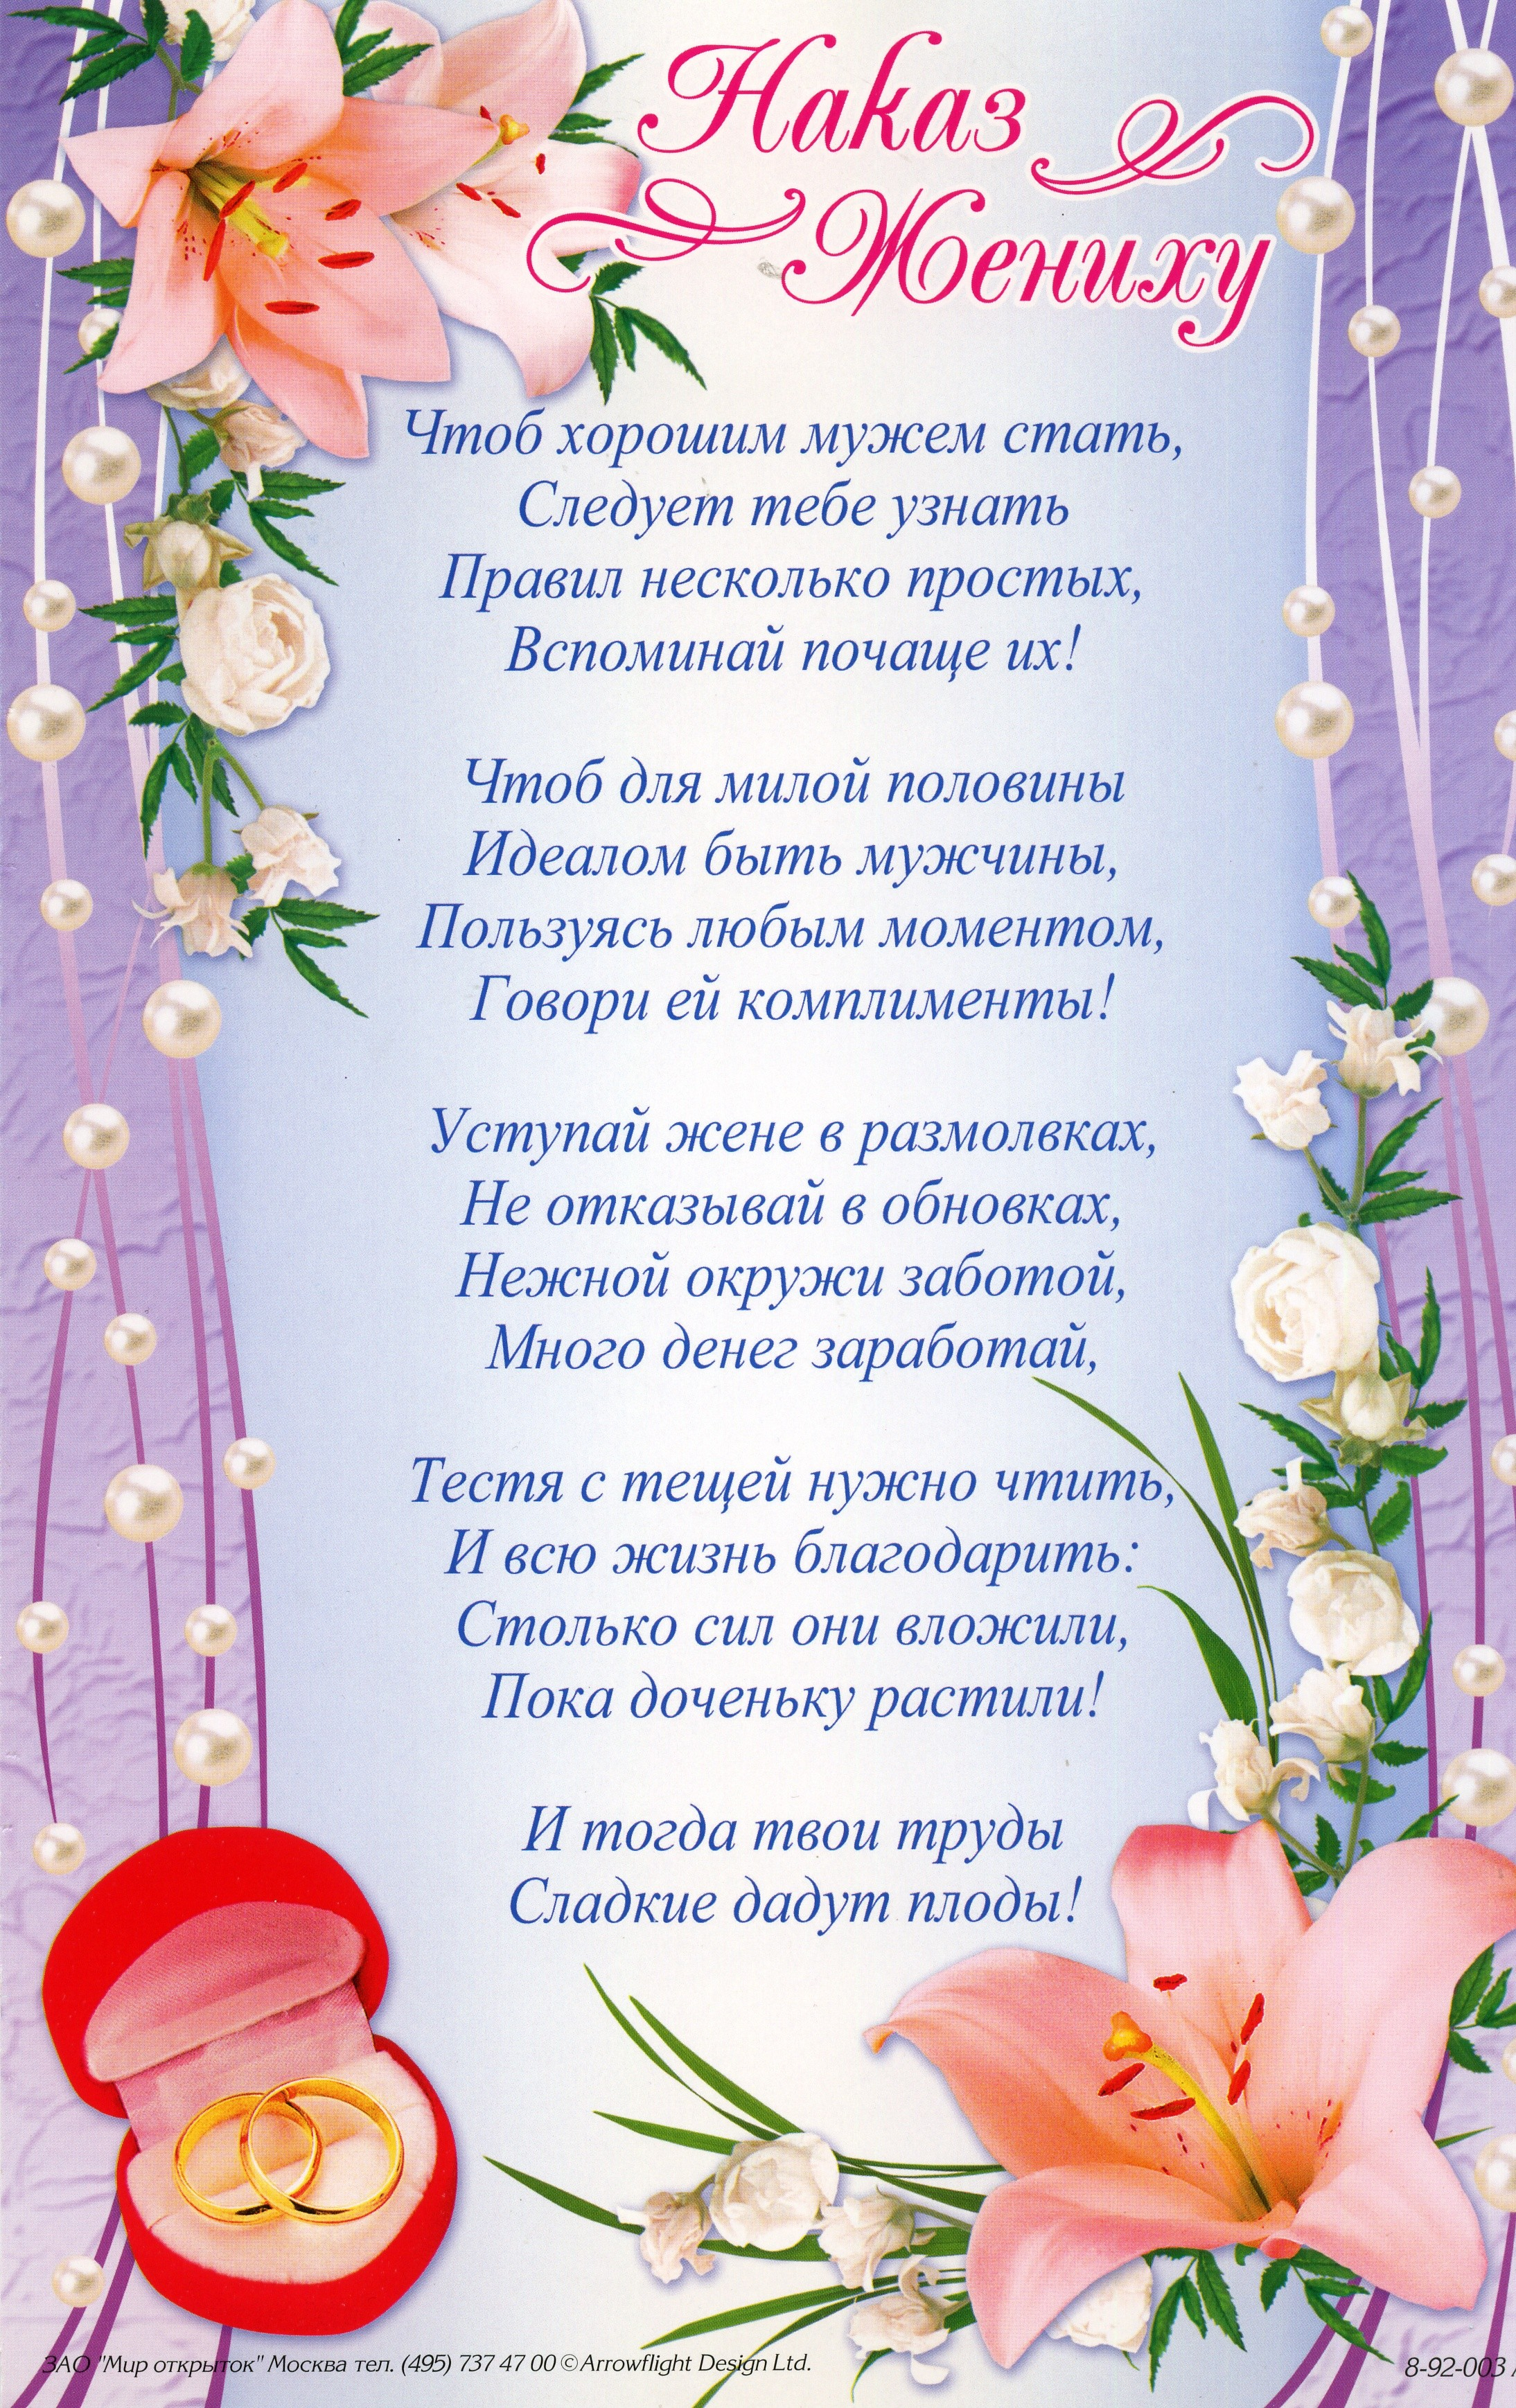 Стих поздравление на свадьбу от ребенка родителям